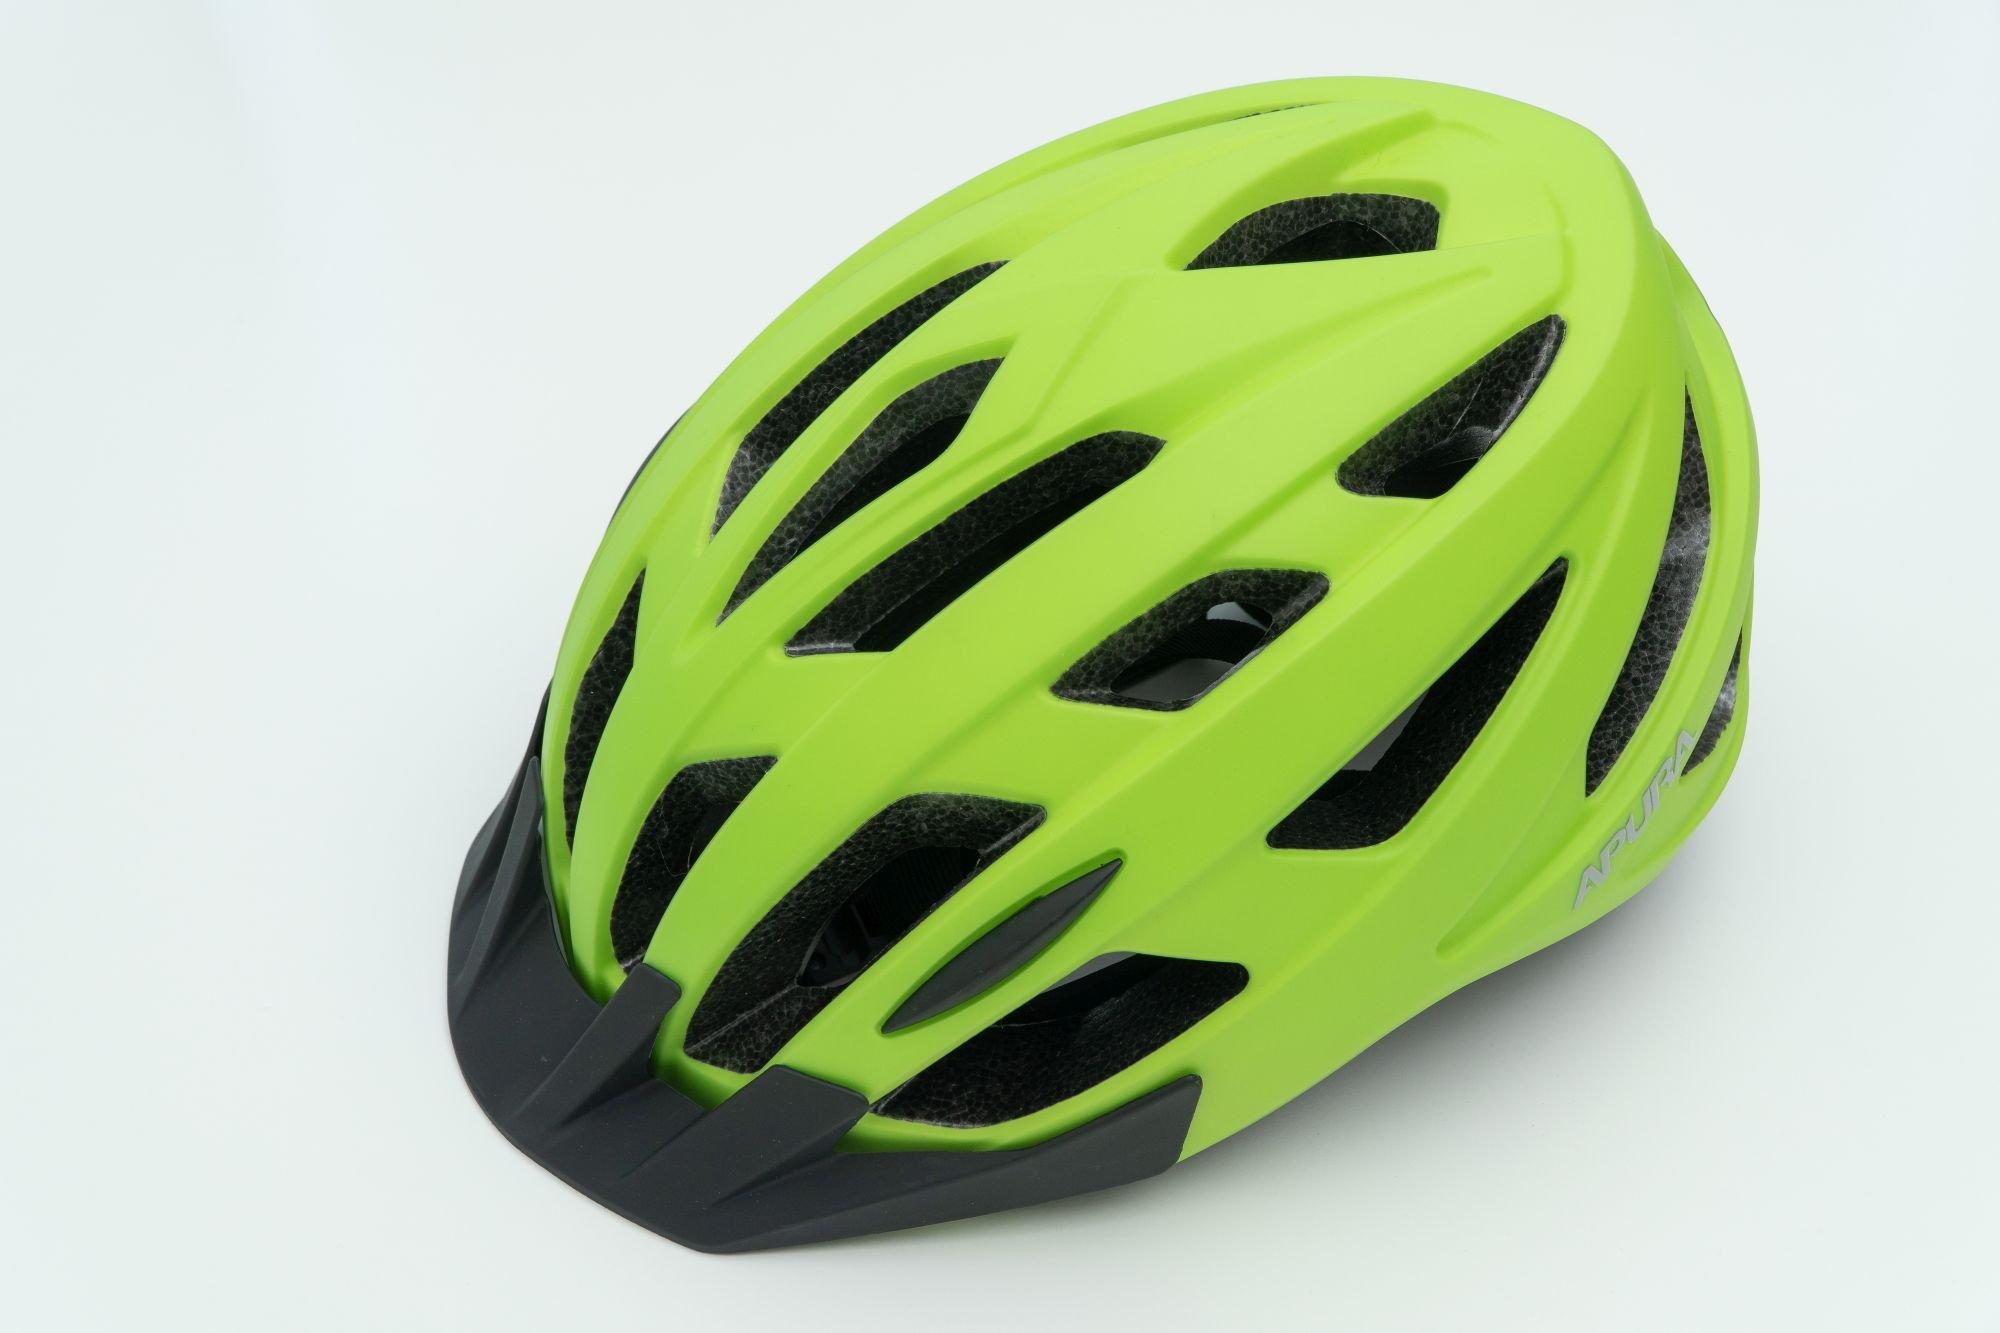 Casco da bicicletta Apura Kingston 54-58 cm lime opaco